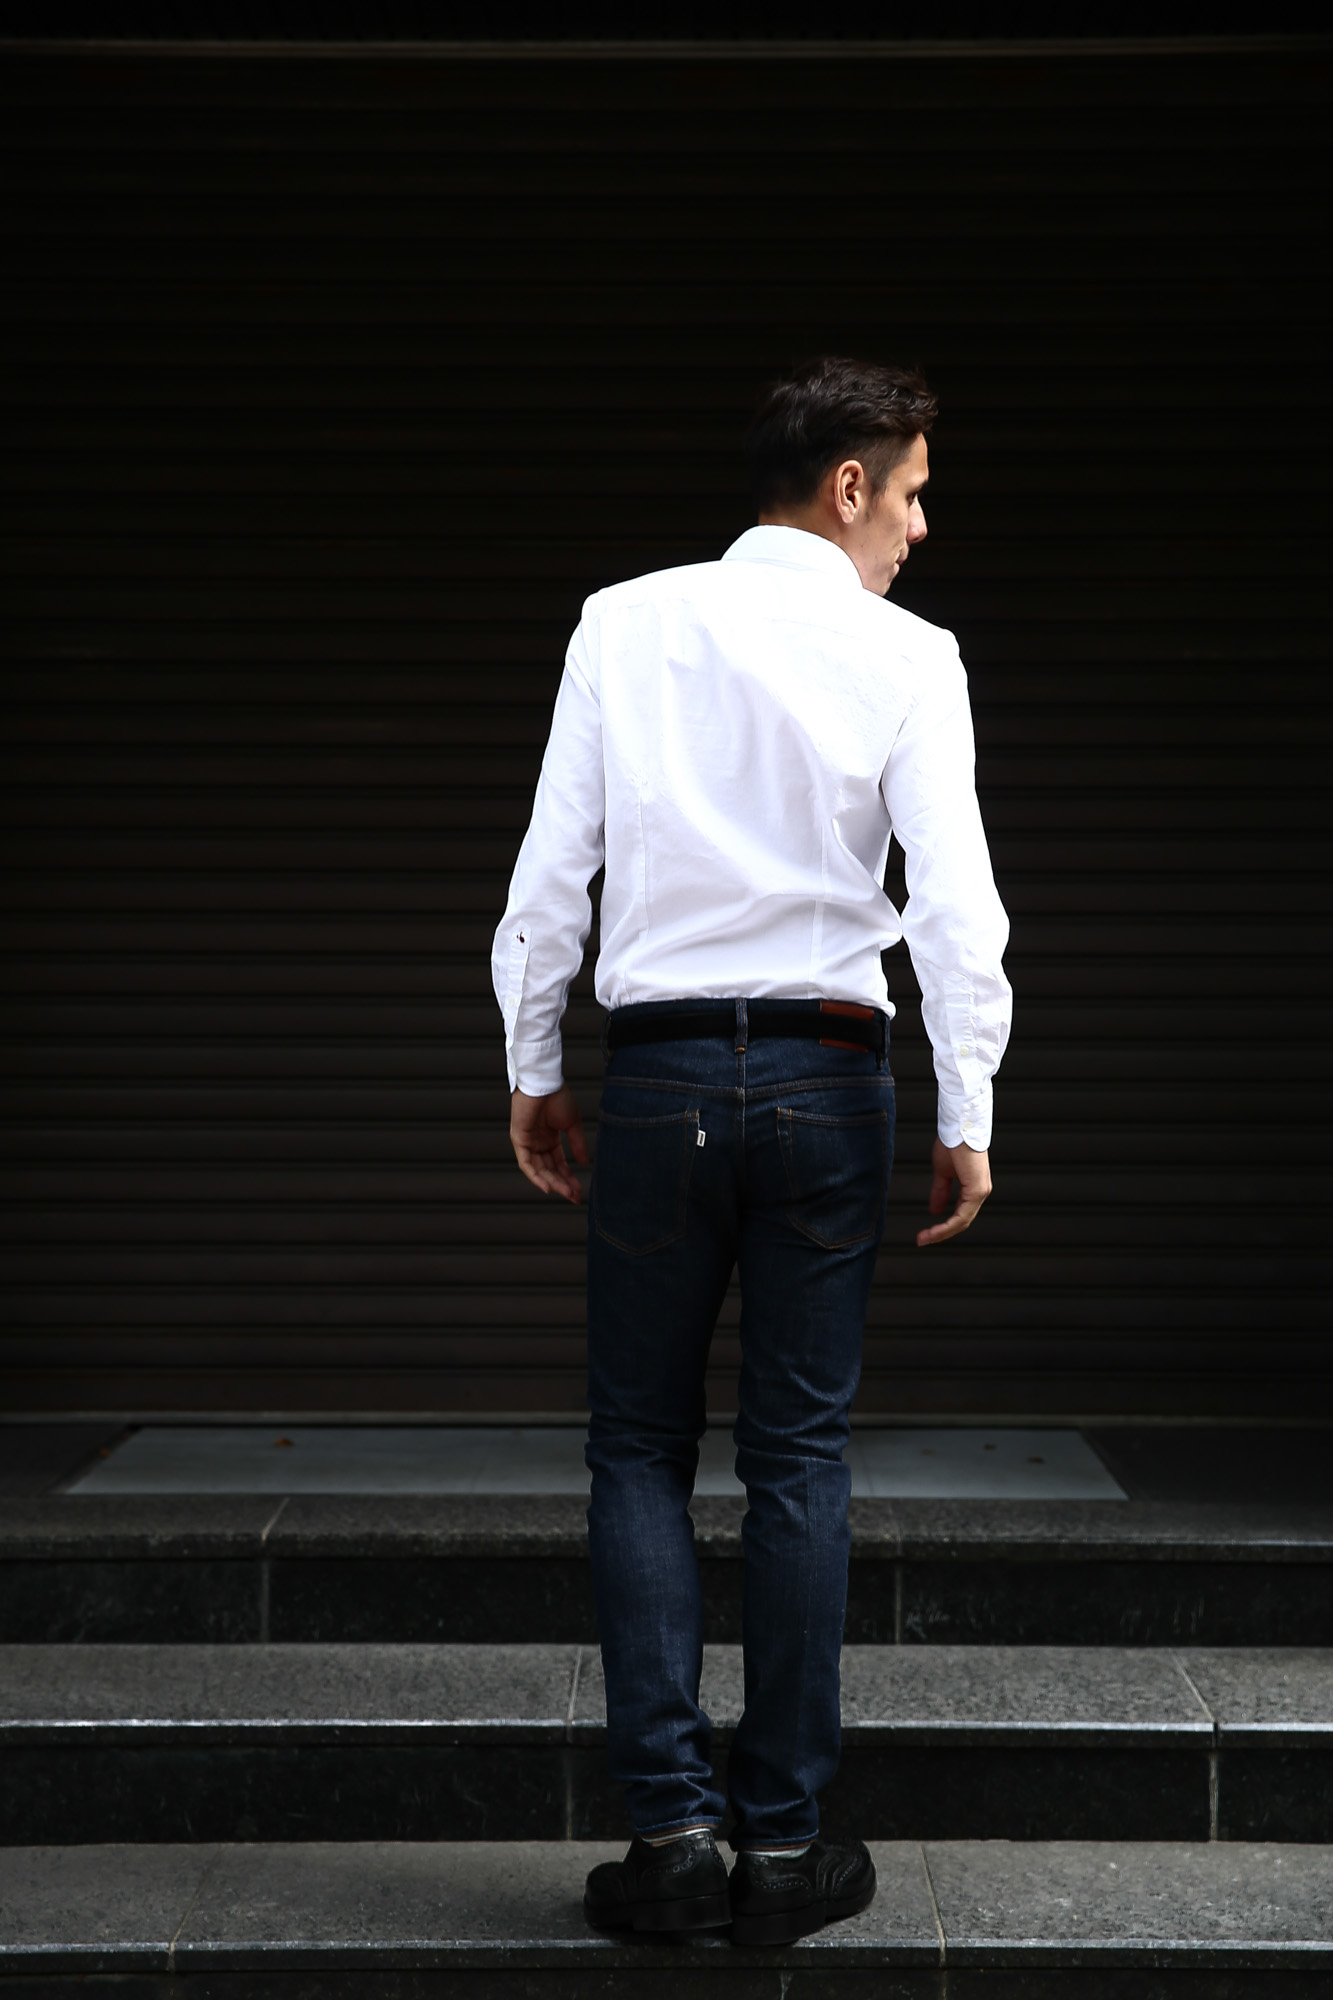 Glanshirt (グランシャツ) JWEEN G6971 OXFORD COTTON 100% カッタウェイシャツ オックスフォードシャツ WHITE (ホワイト・001) MADE IN ITALY(イタリア製) 2016 秋冬新作愛知 名古屋ZODIAC ゾディアック シャツ 白シャツ 36,37,38,39,40,41